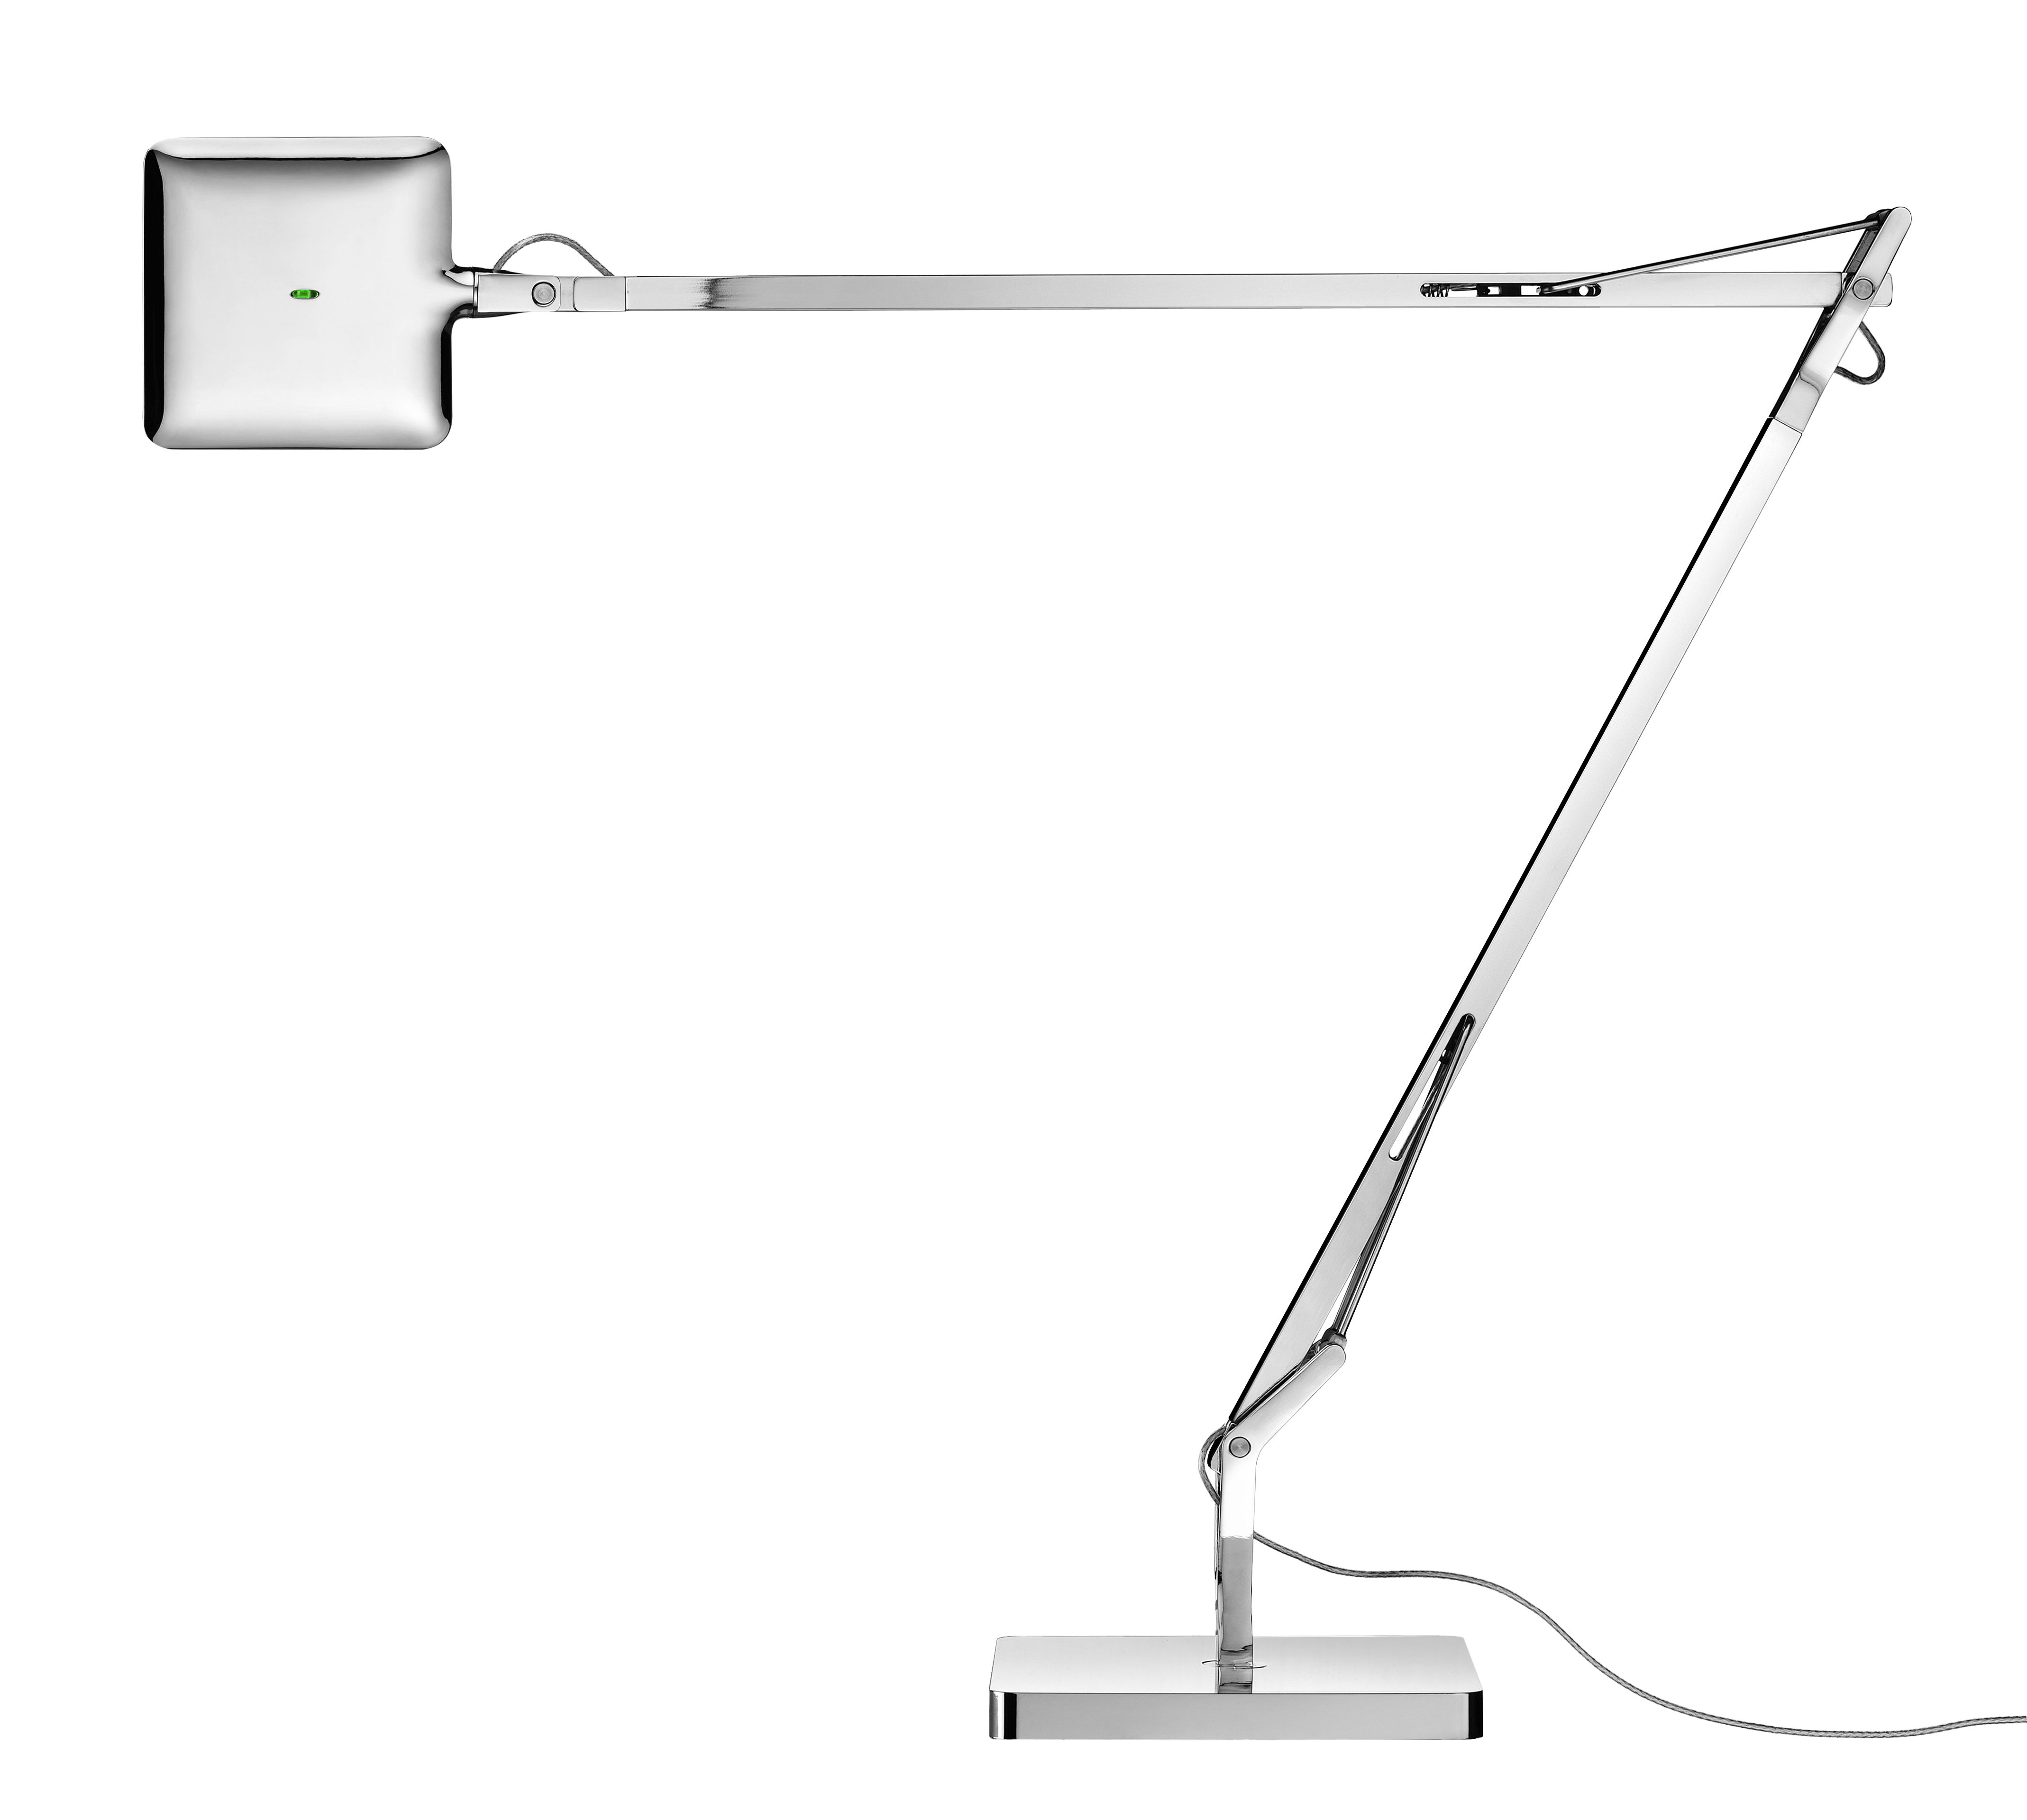 flos lampada da tavolo kelvin led green mode : Scopri Lampada da tavolo Kelvin LED Green -/ Con risparmio energetico di Flos, Made In Design Italia